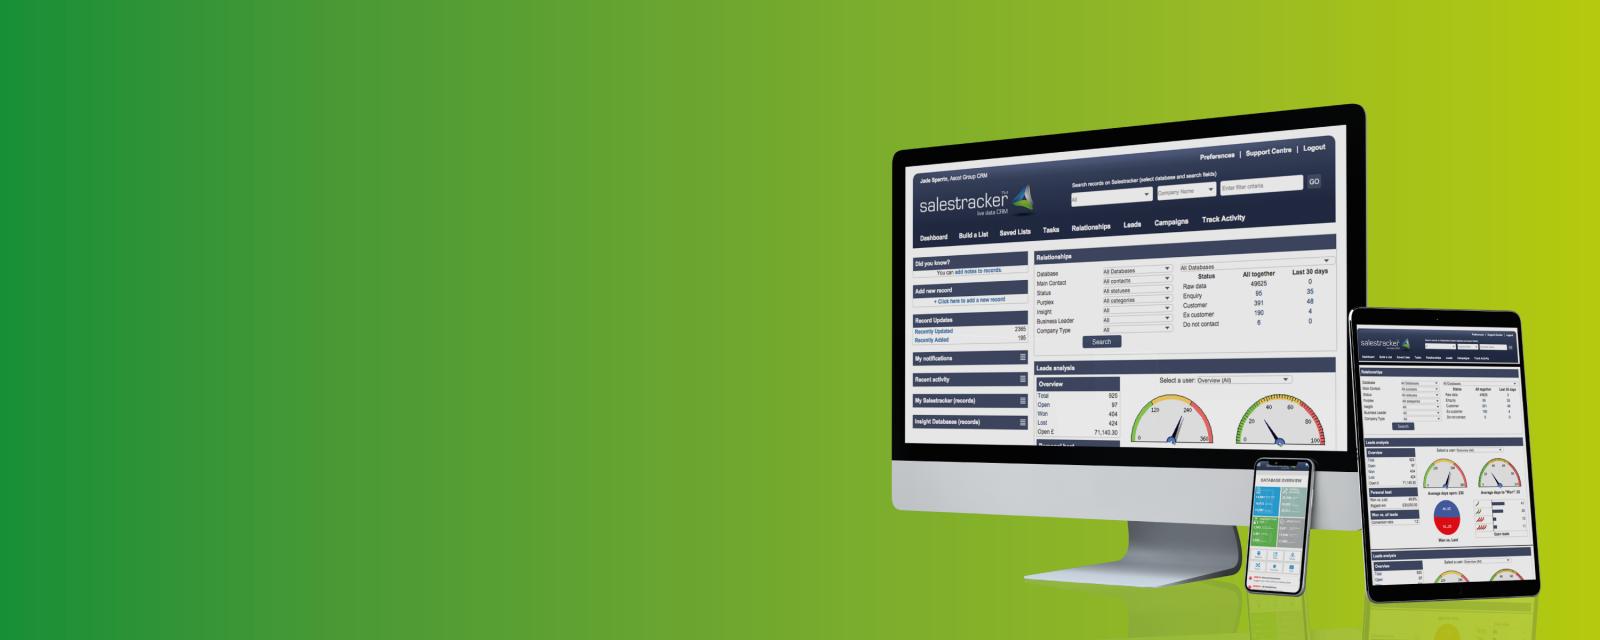 Salestracker & Software Applications